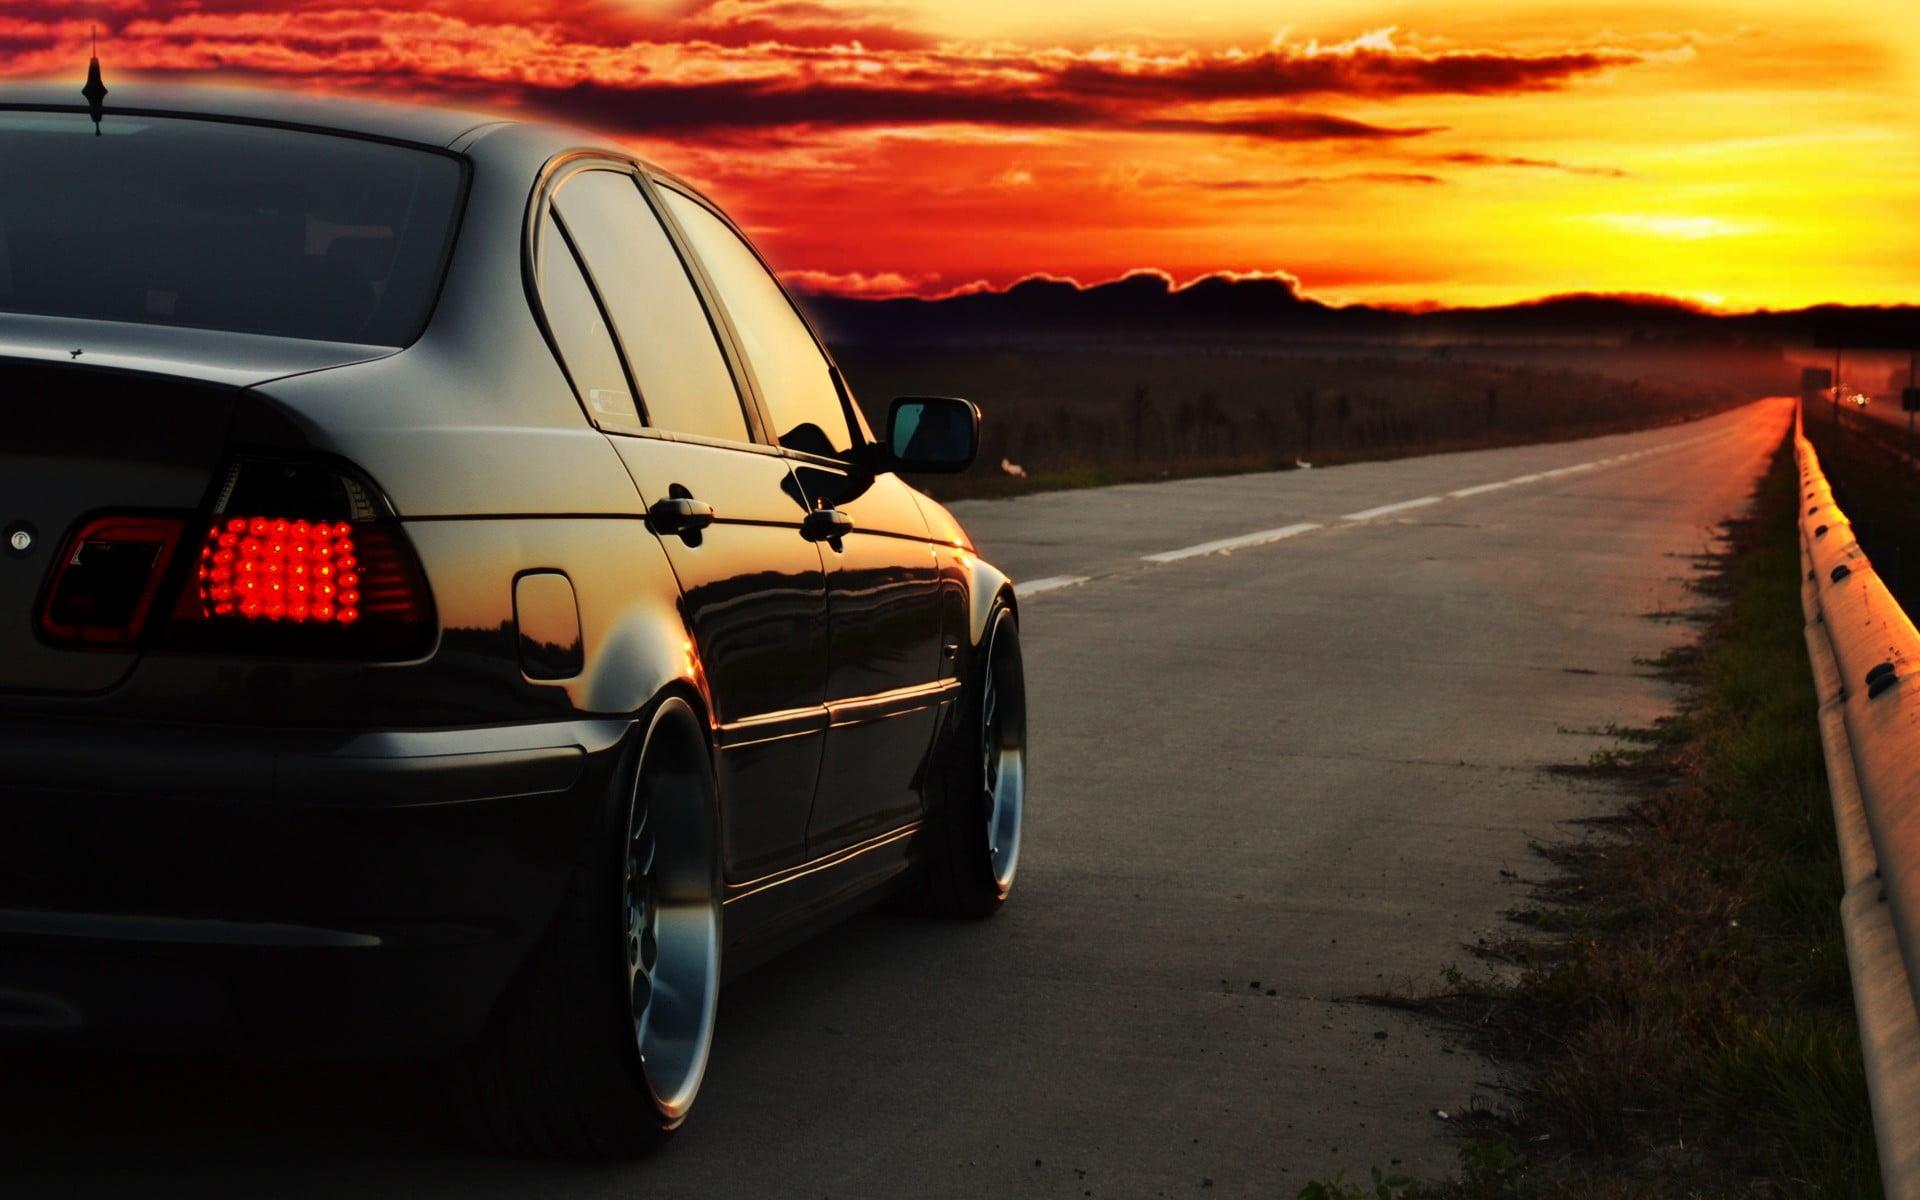 Black sedan BMW E46 Photoshop sunset road HD wallpaper 1920x1200